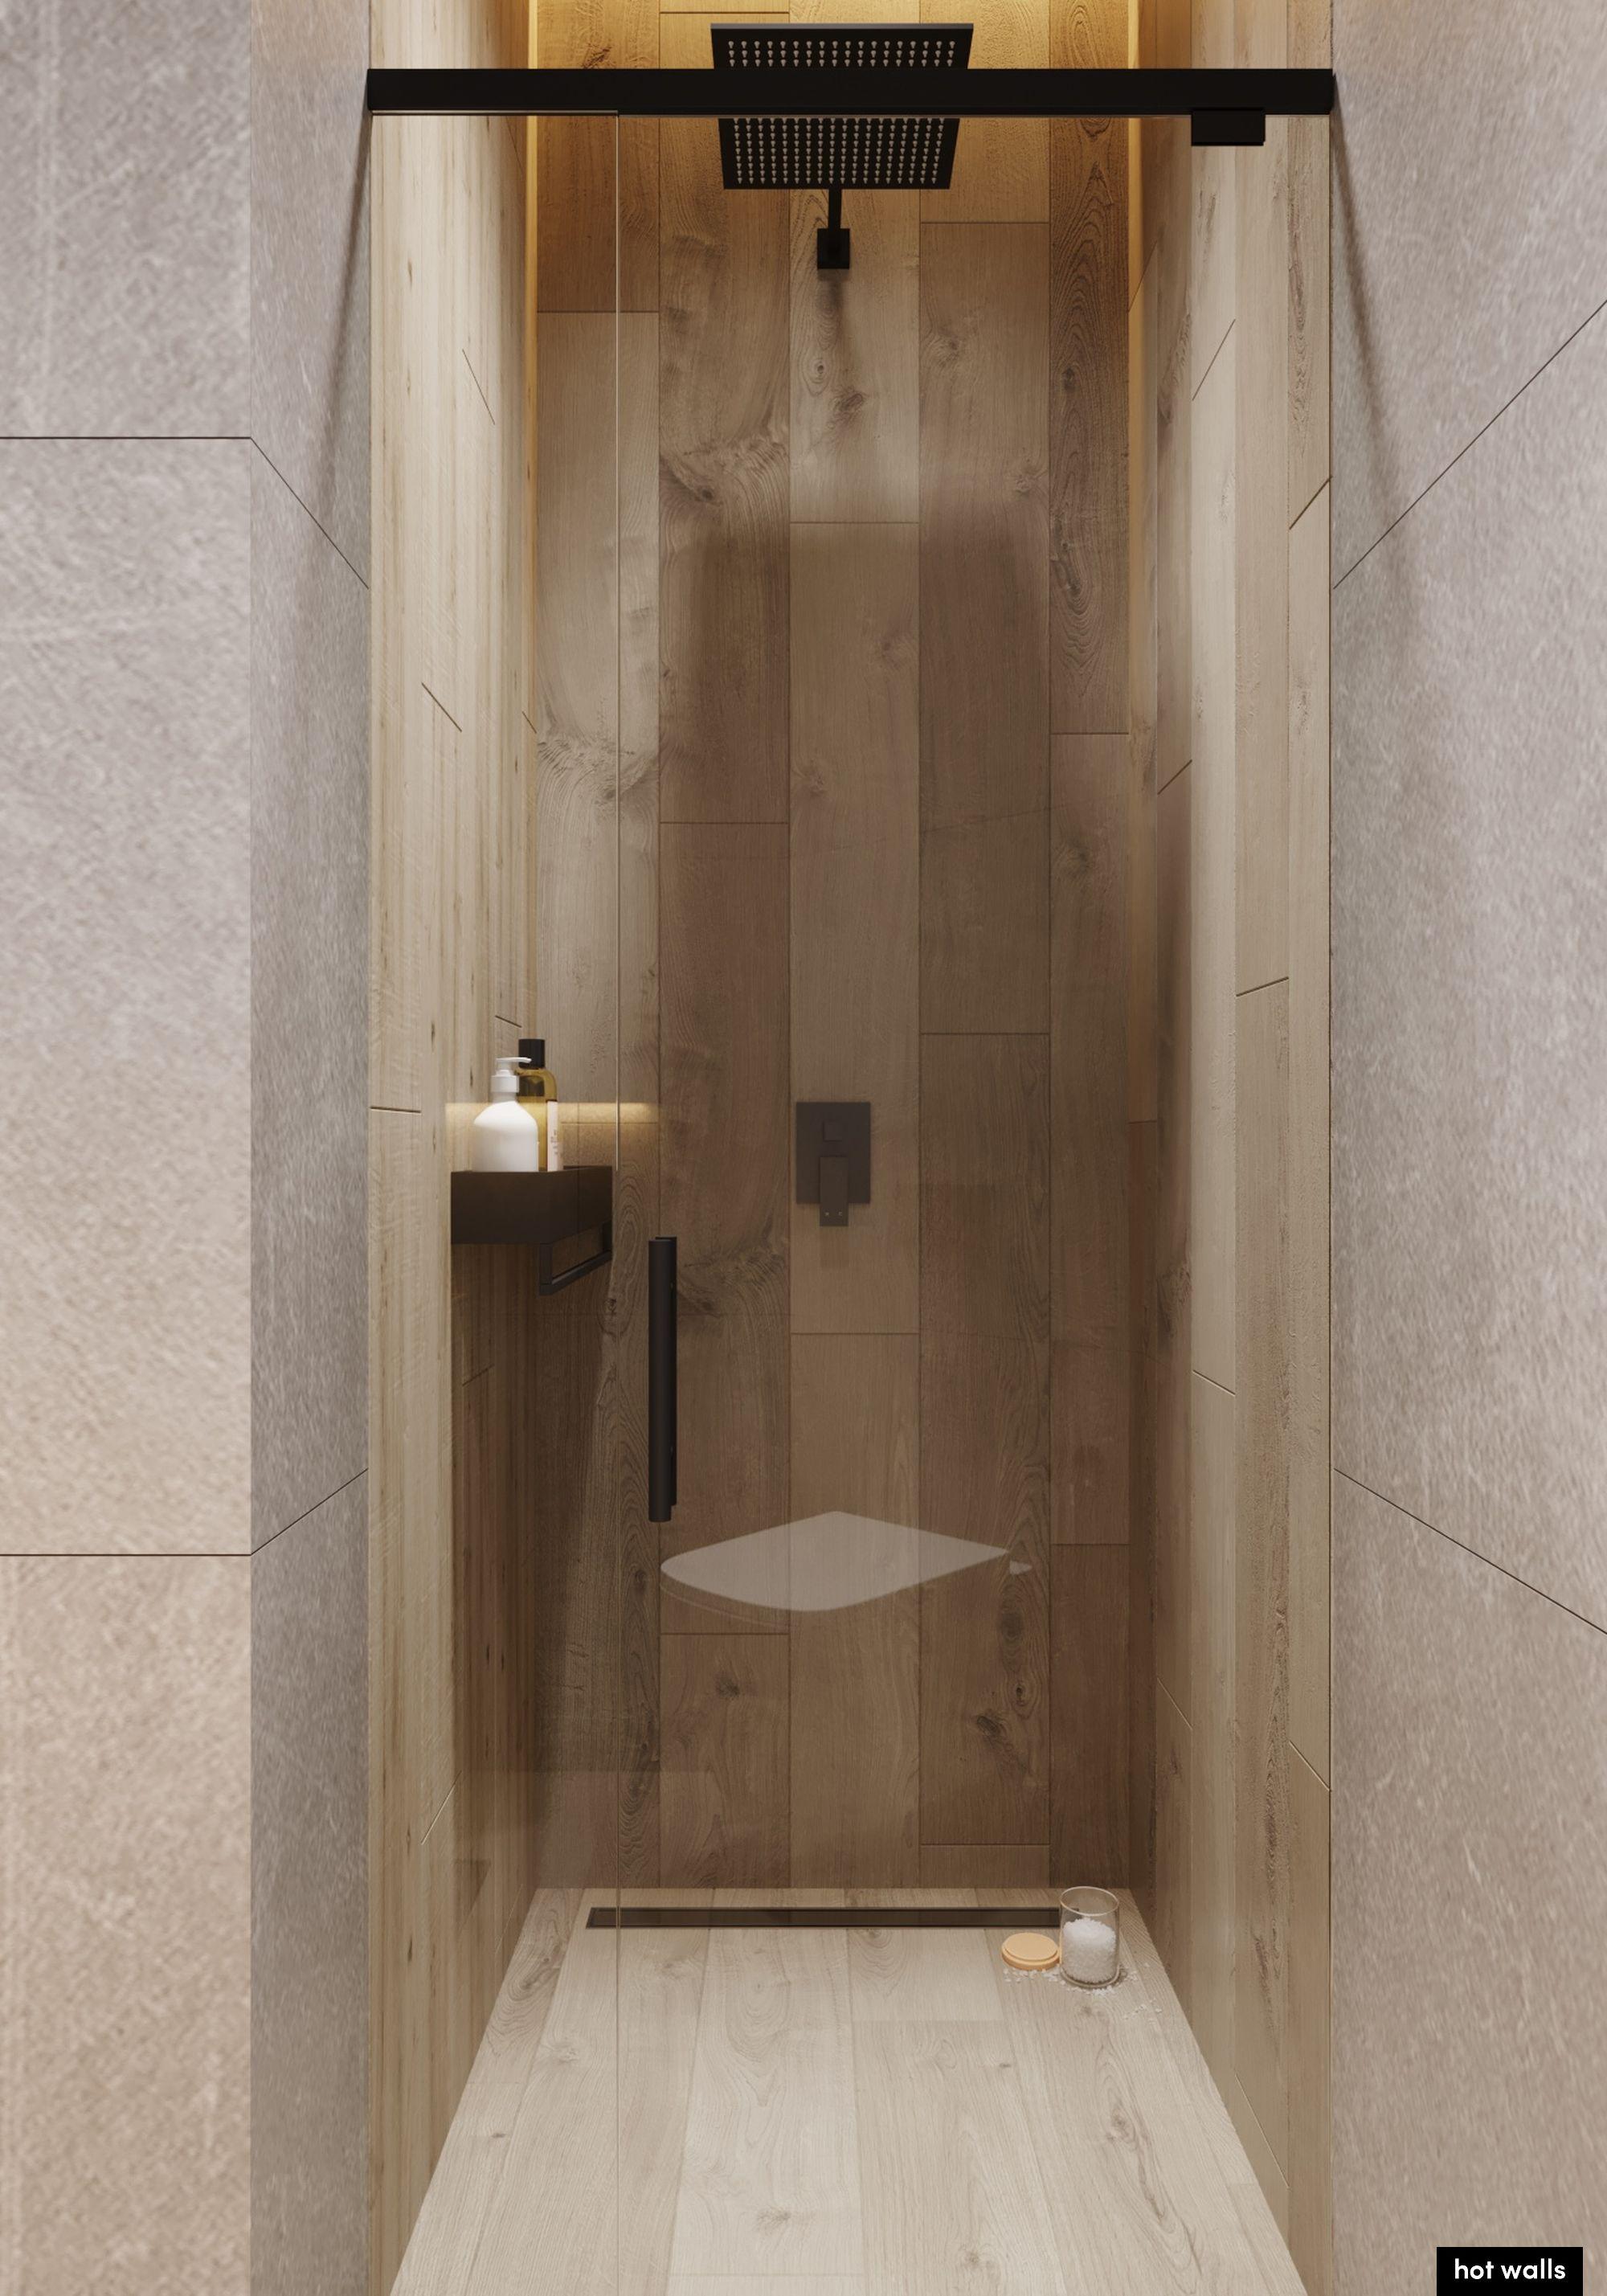 SECOND BATHROOM 2